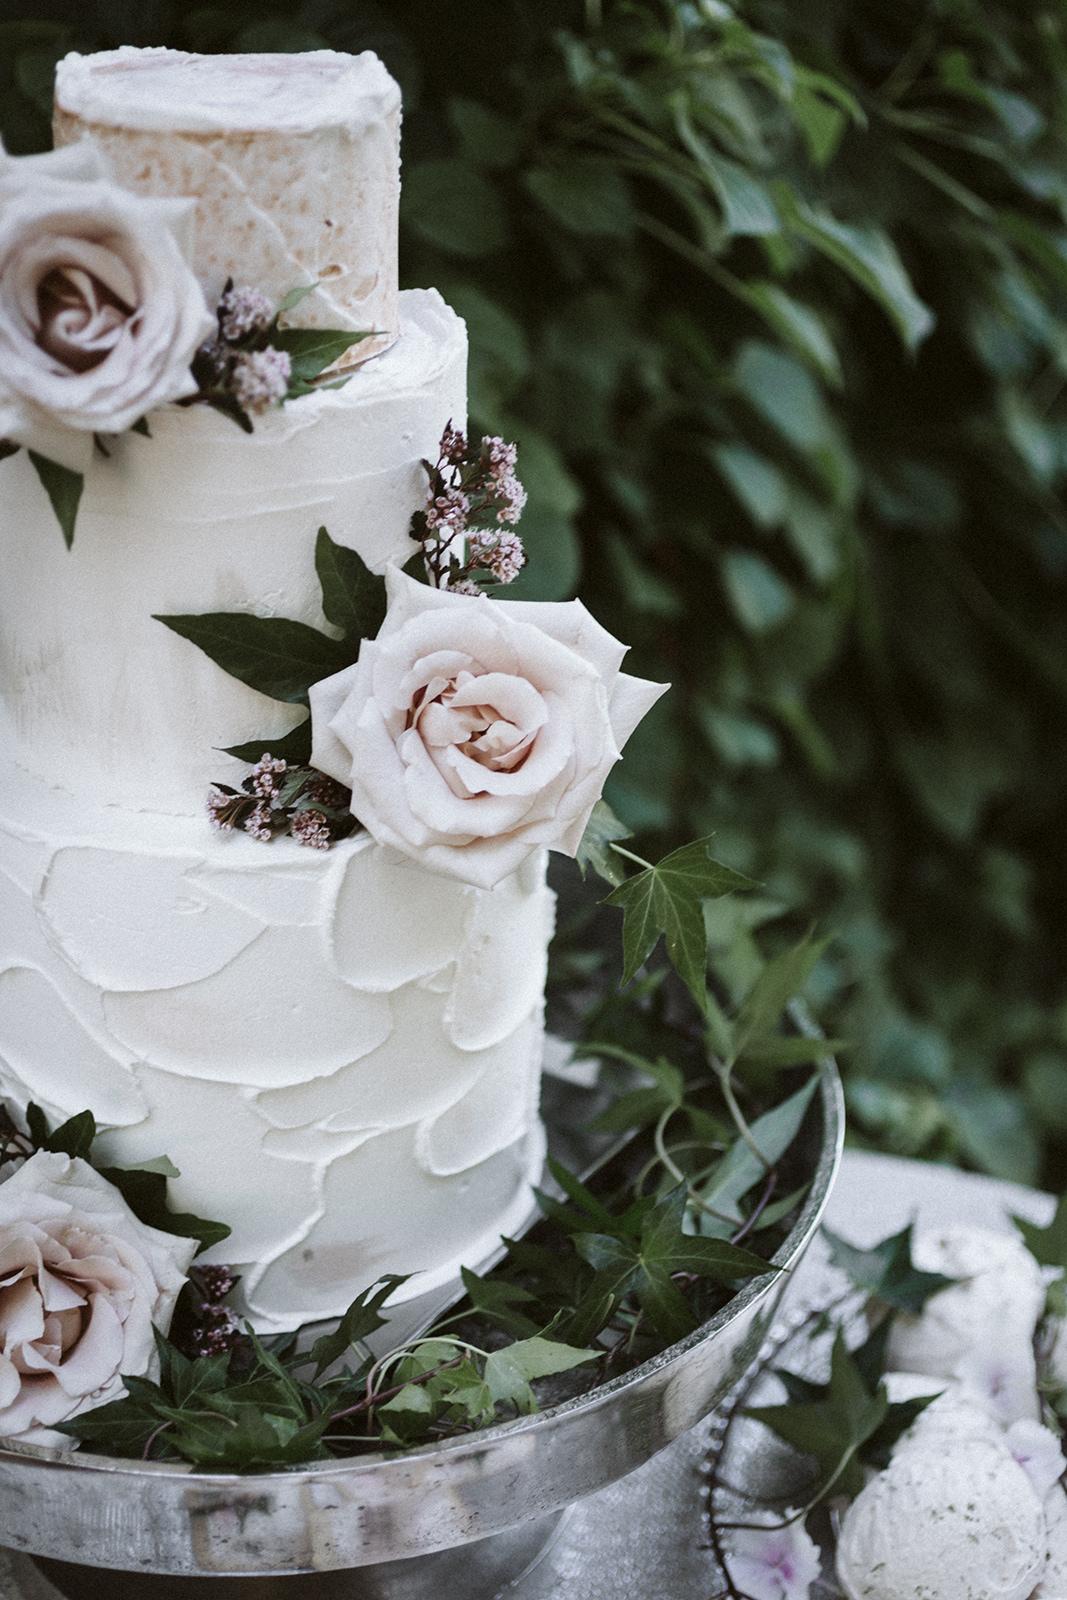 Rose Wedding Cake Chicago Wedding lisa kathan photography